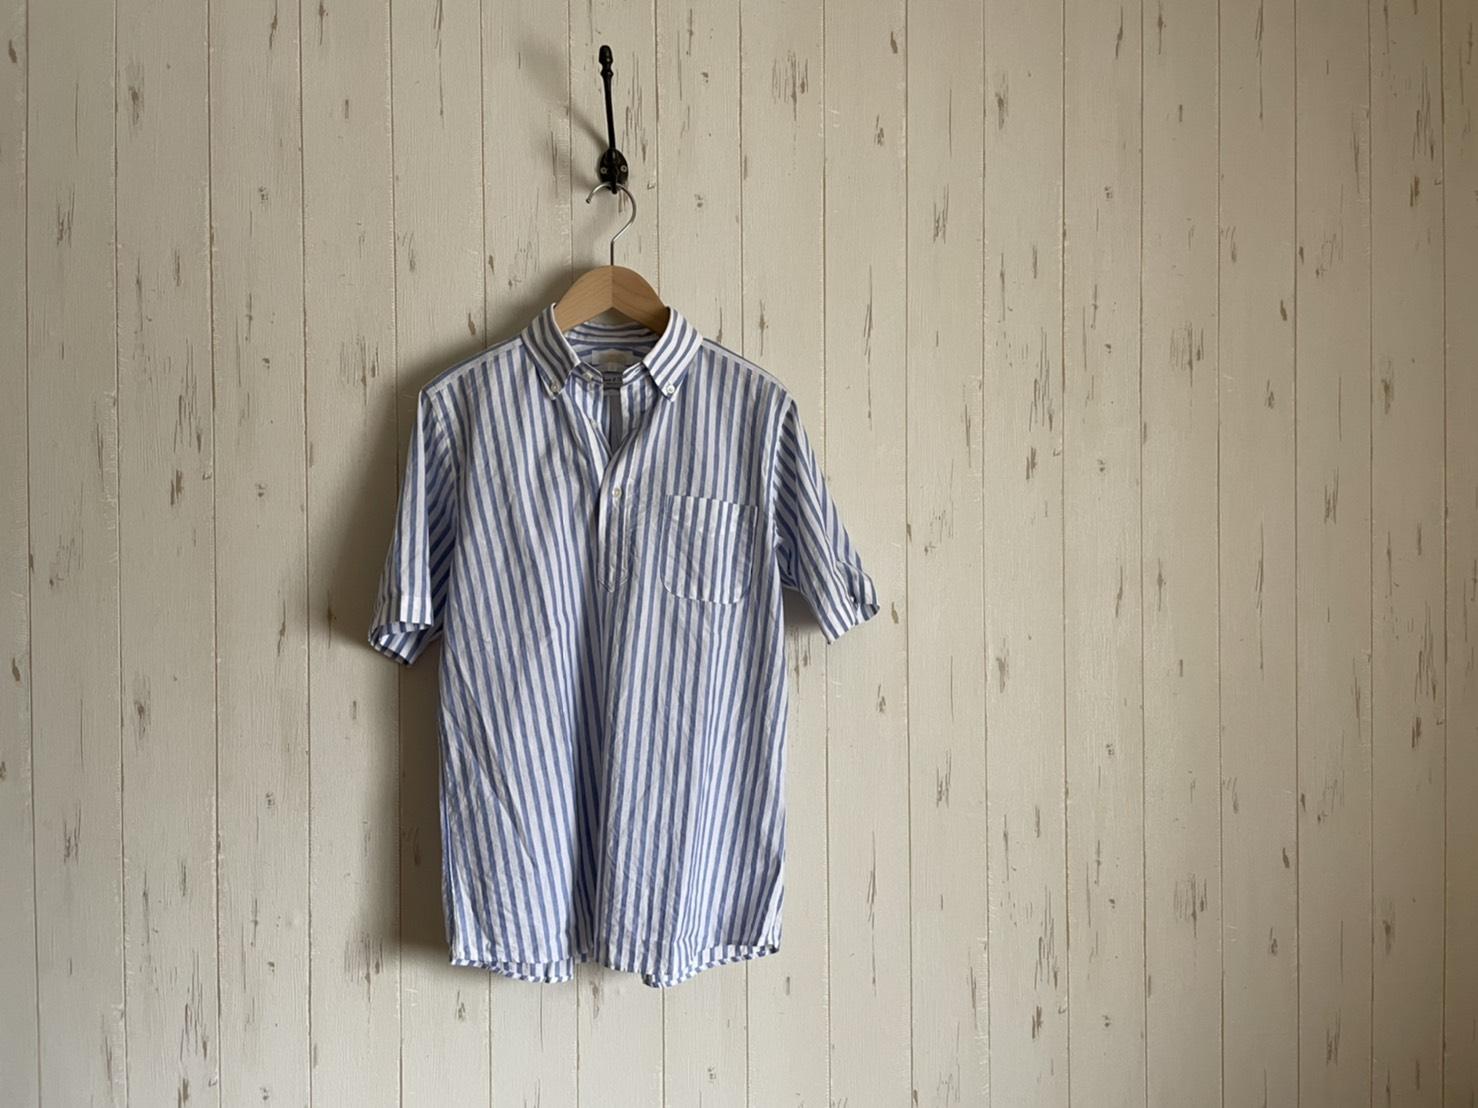 SOUTIENCOL RE-MAKE POLO Short sleeves